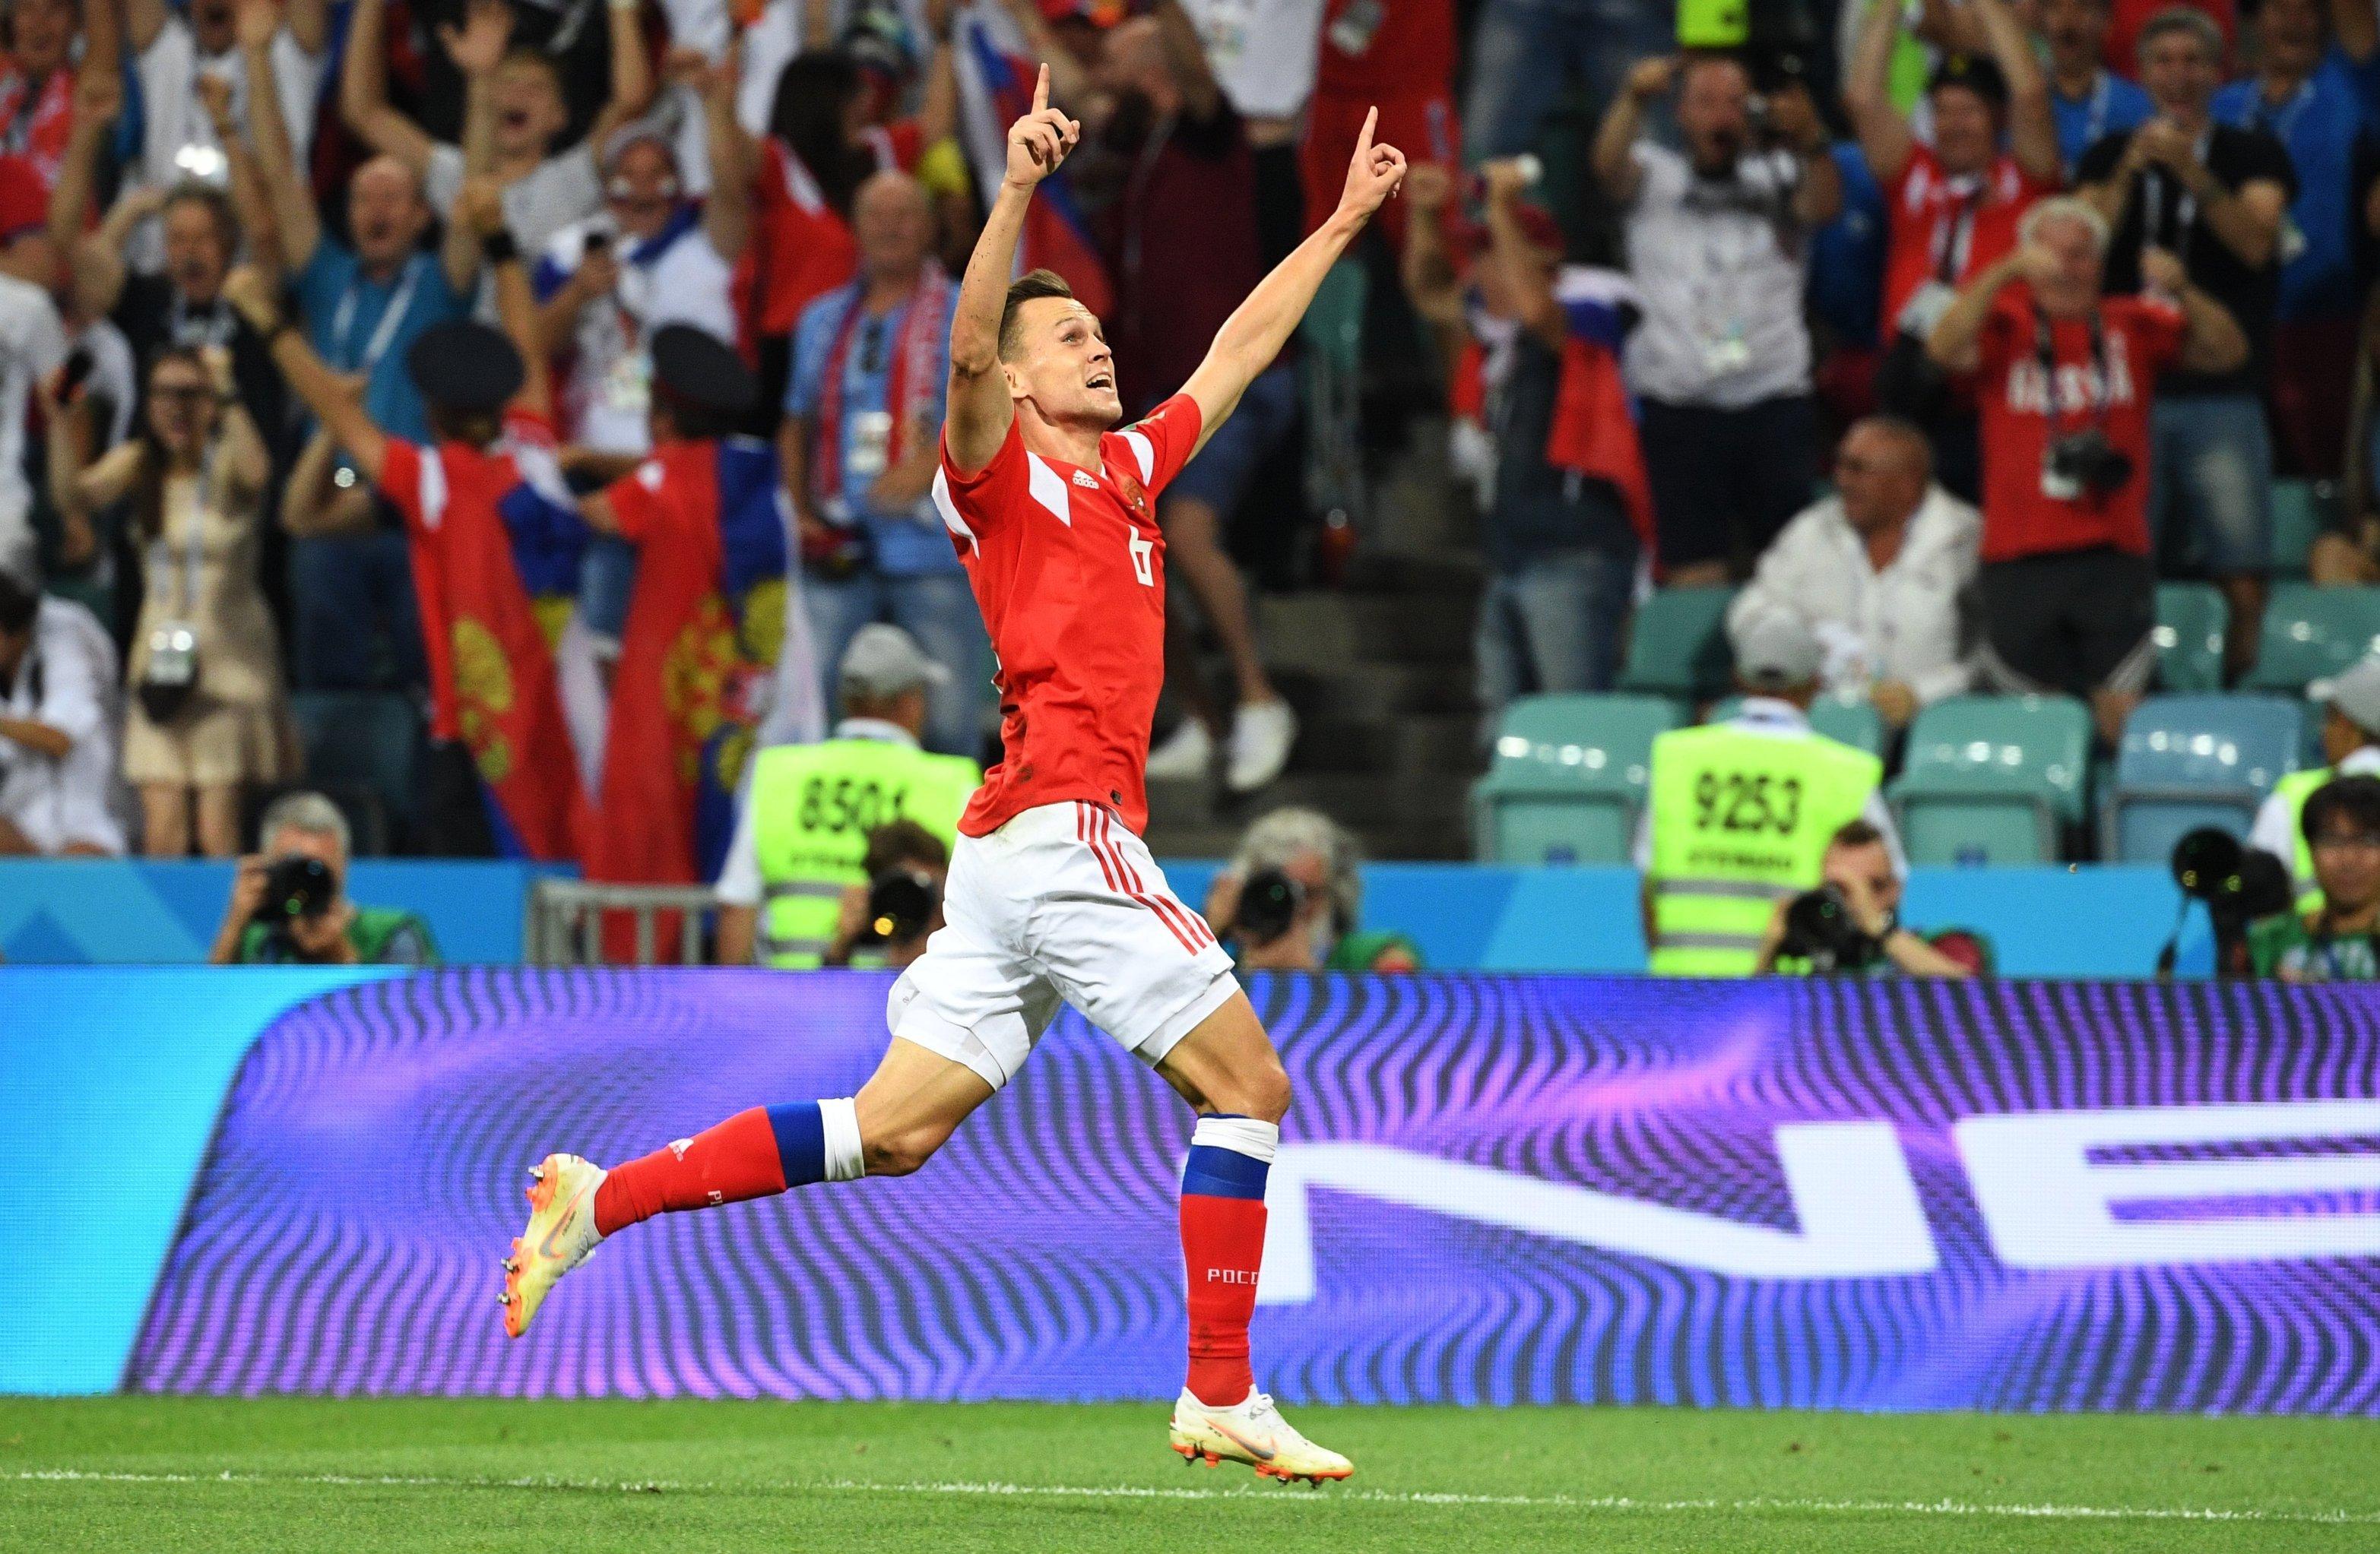 Russia's midfielder Denis Cheryshev triumphs after he scored a goal in the match against Croatia.